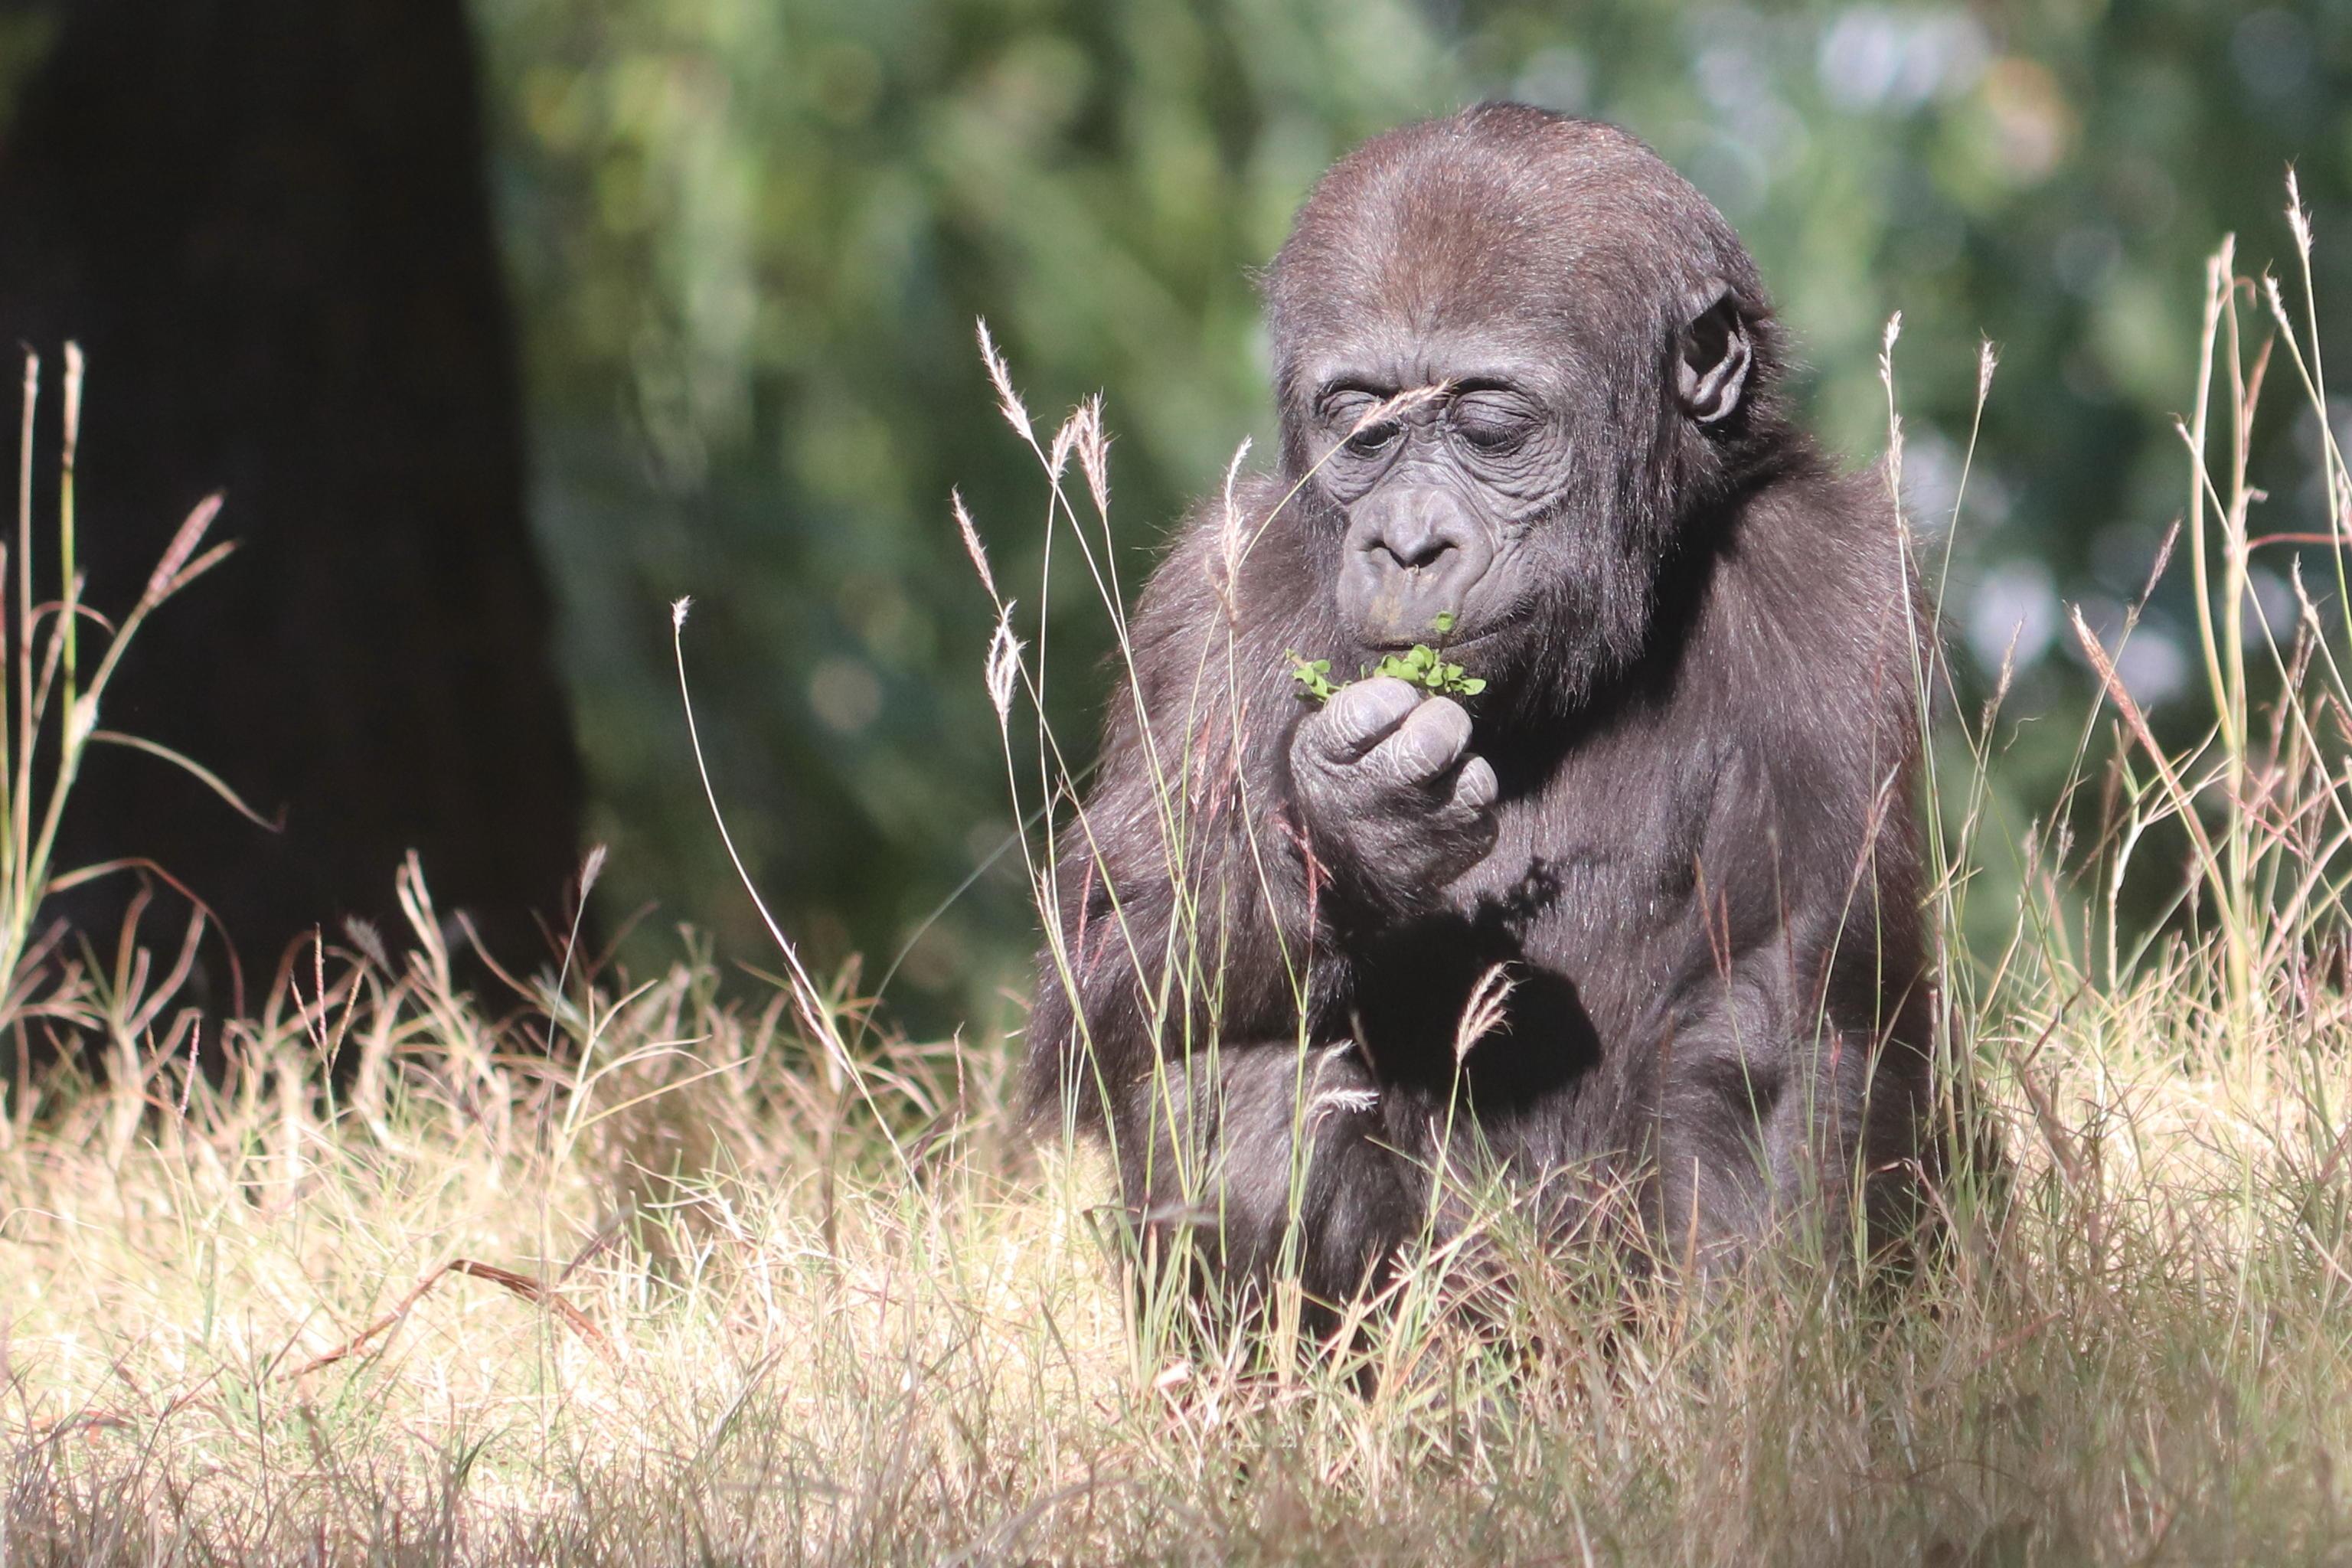 Gorilla at OKC Zoo Credit Thane Johnson